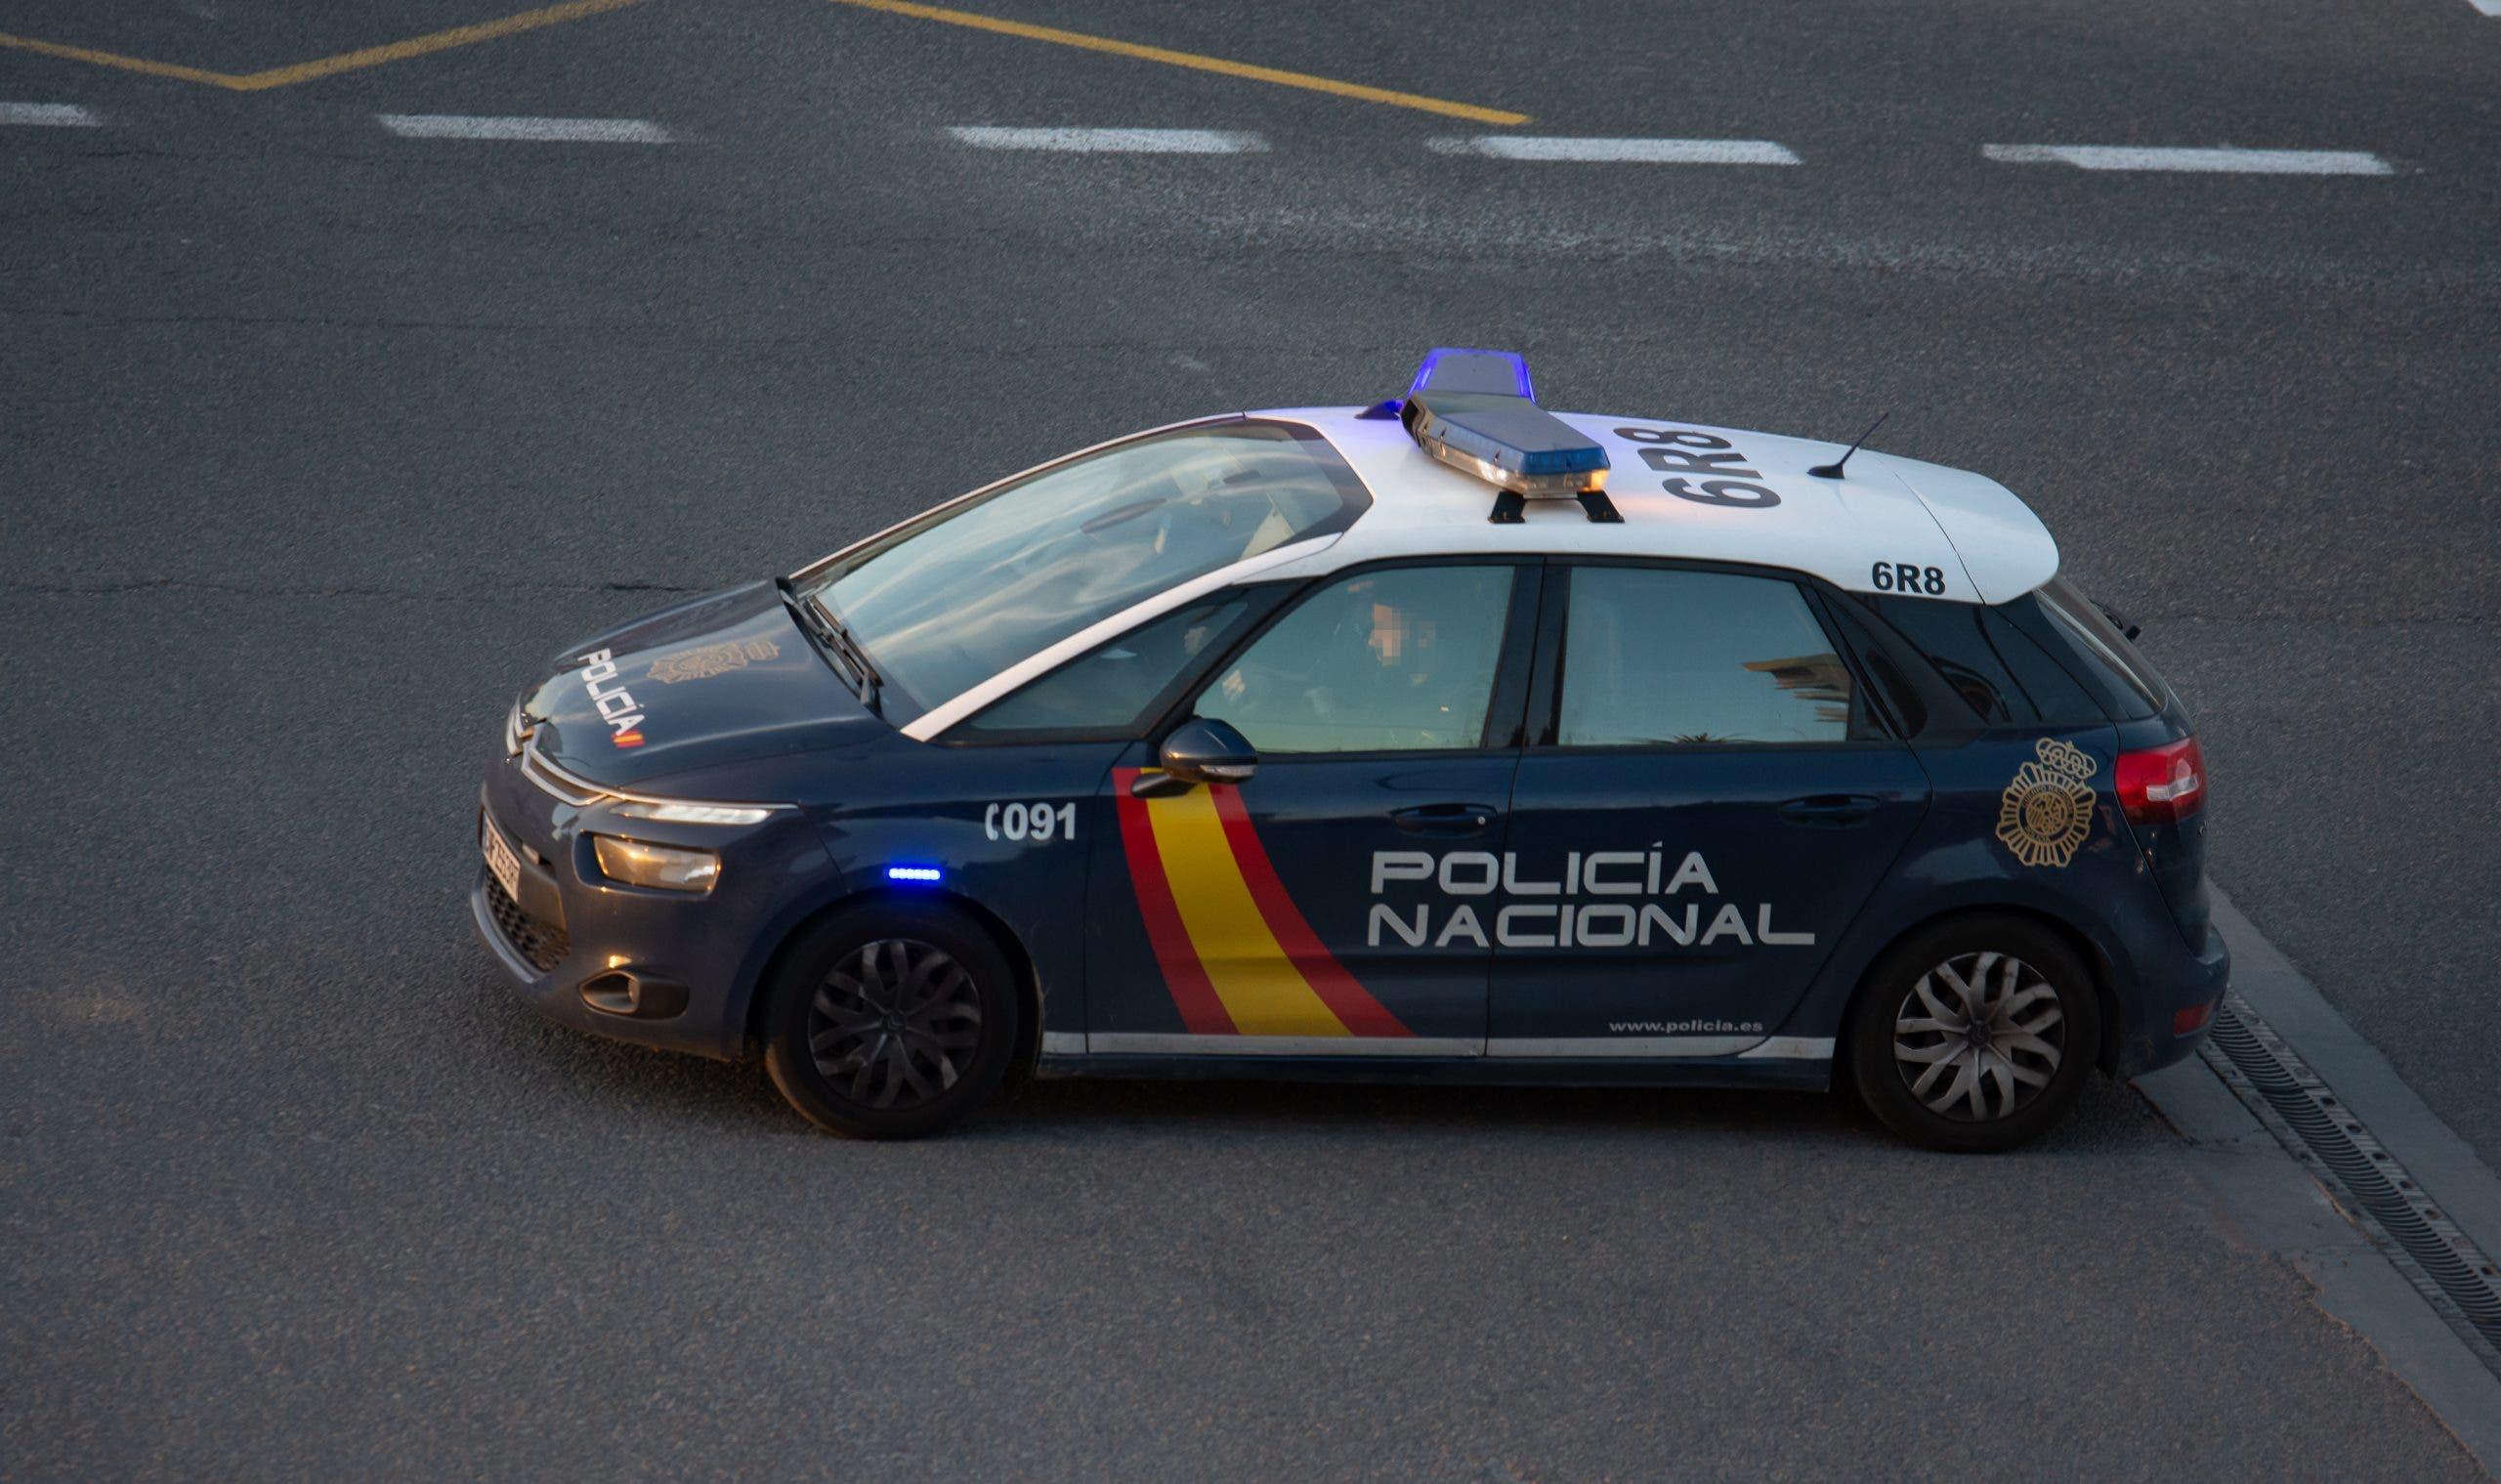 National Police Car